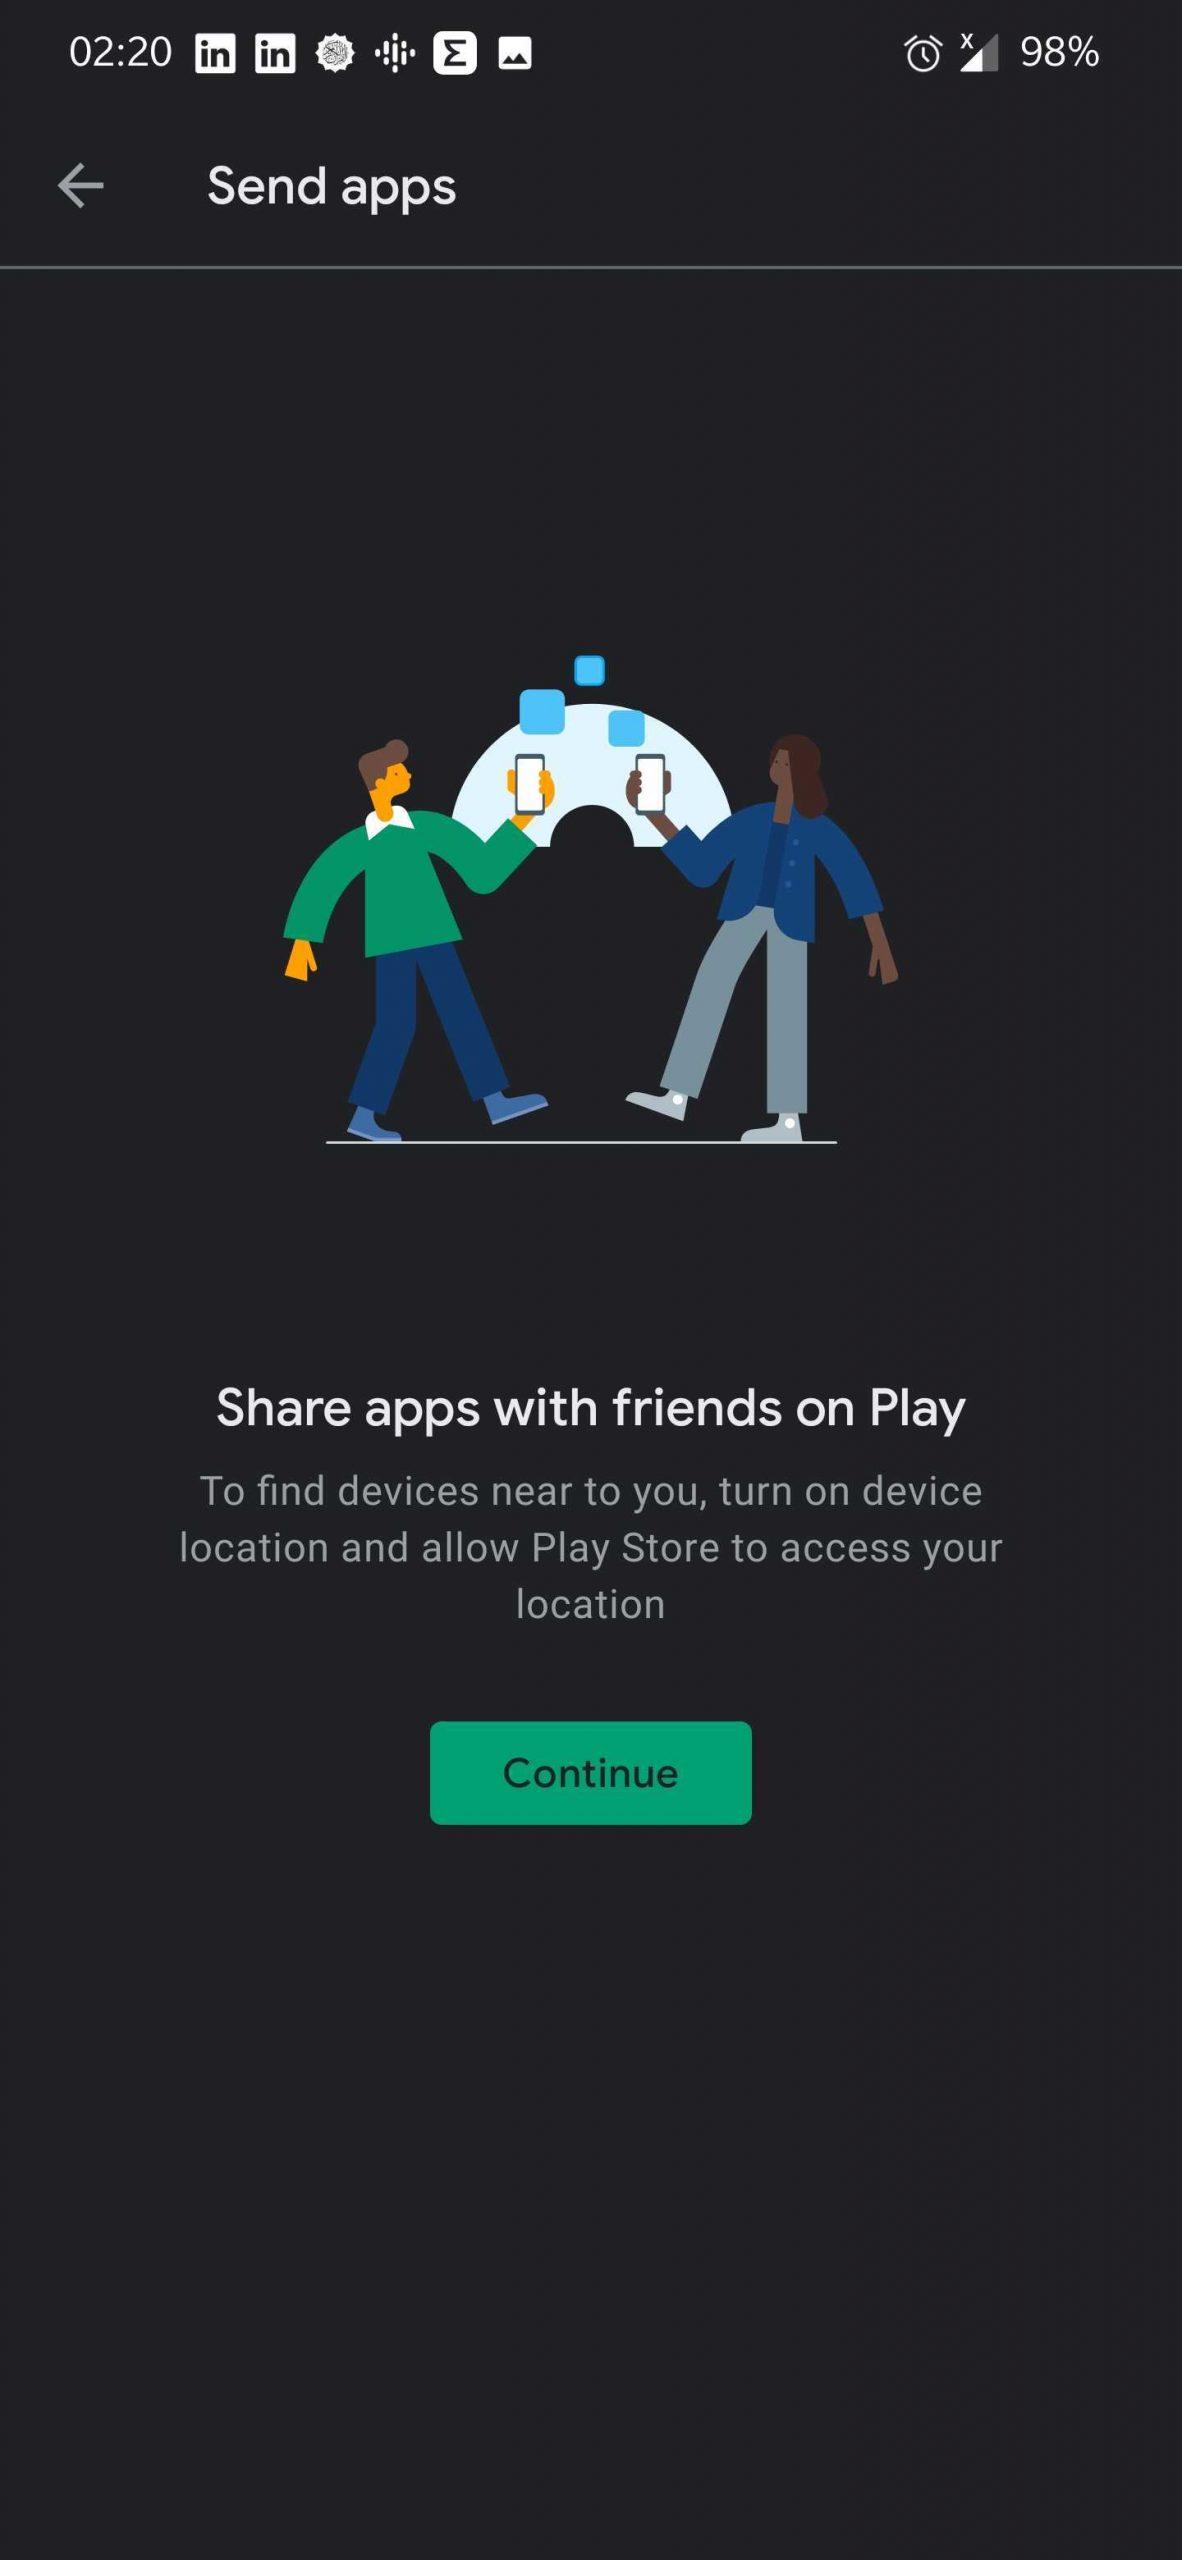 Nearby Share، اندروید، اشتراک گذاری اپلیکیشن